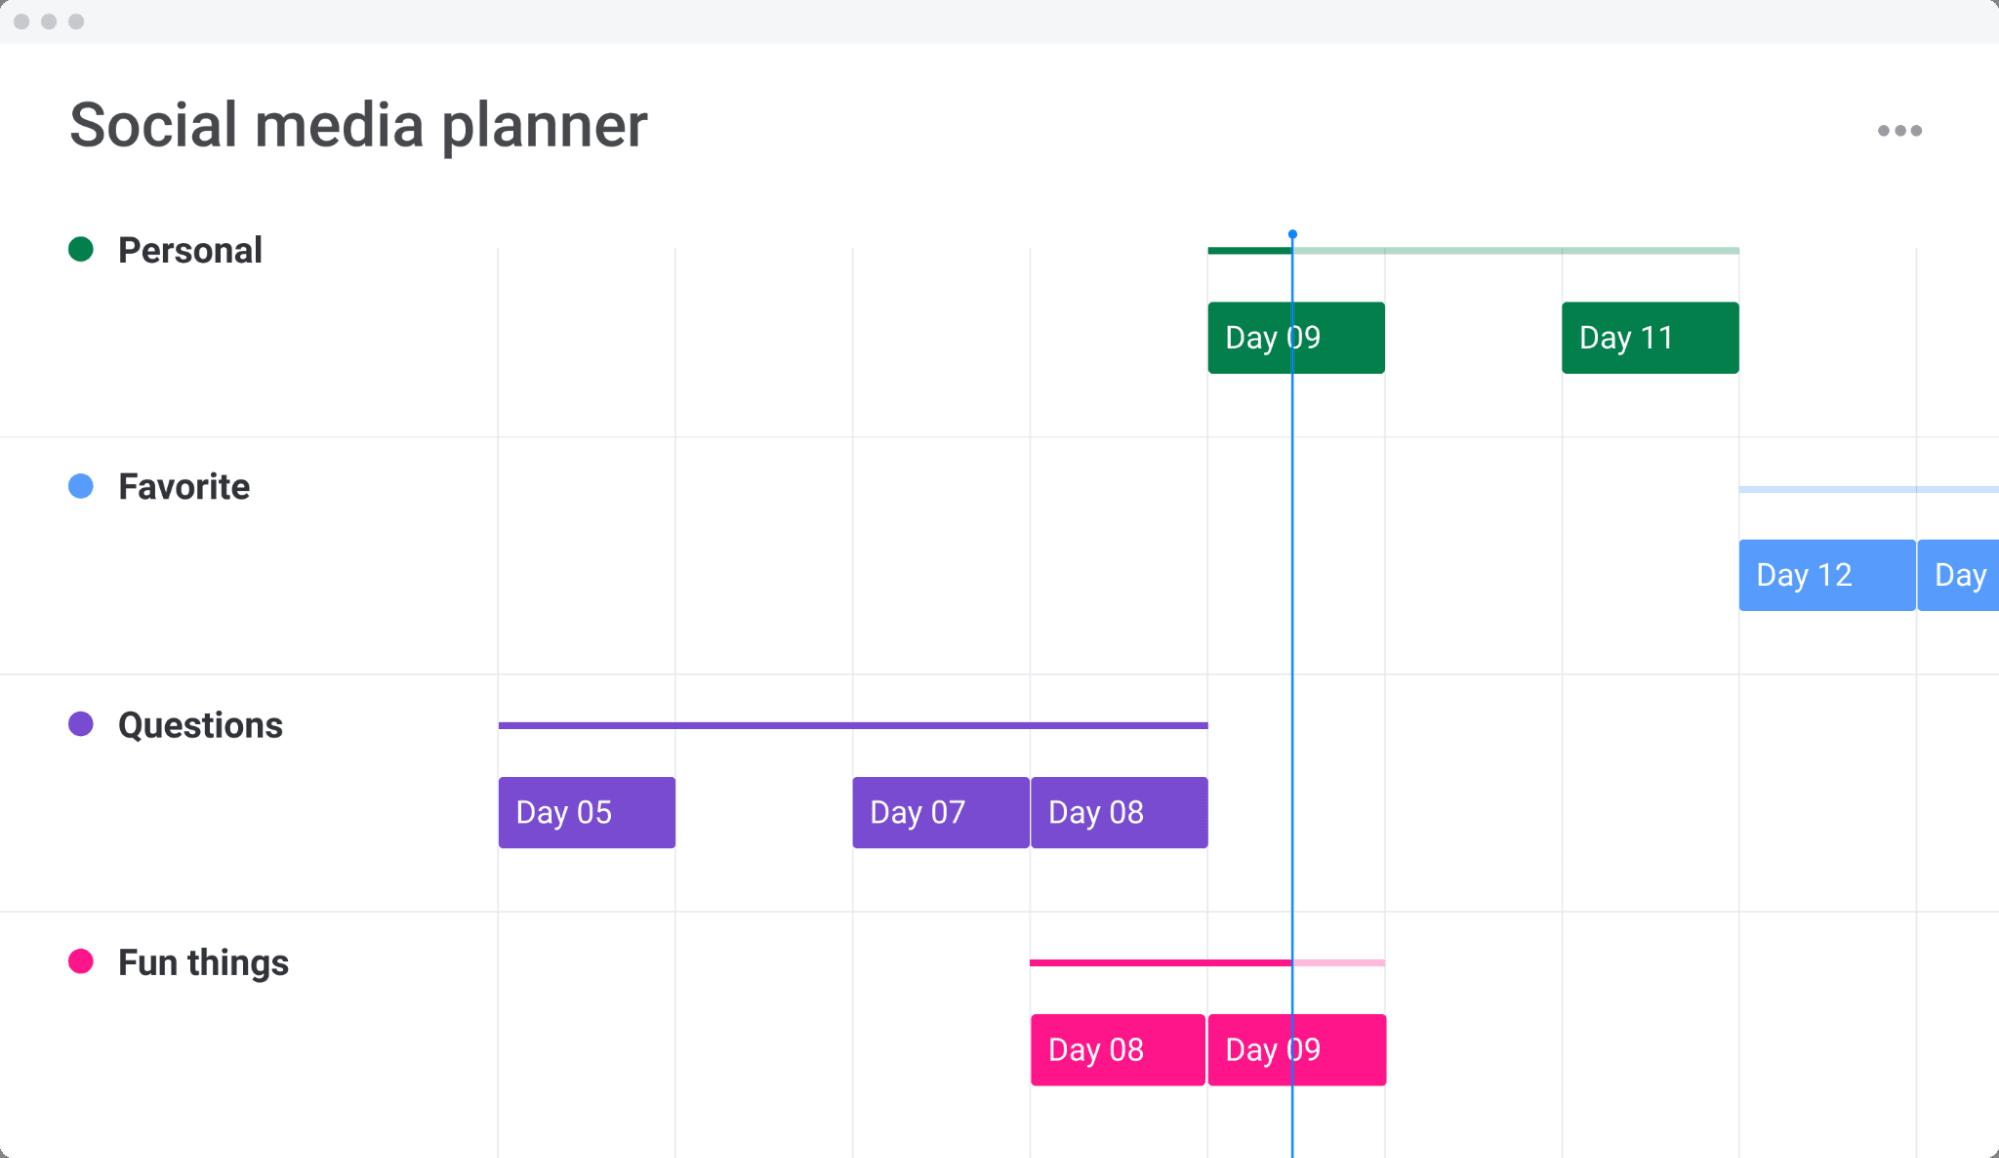 monday.com social media planner template